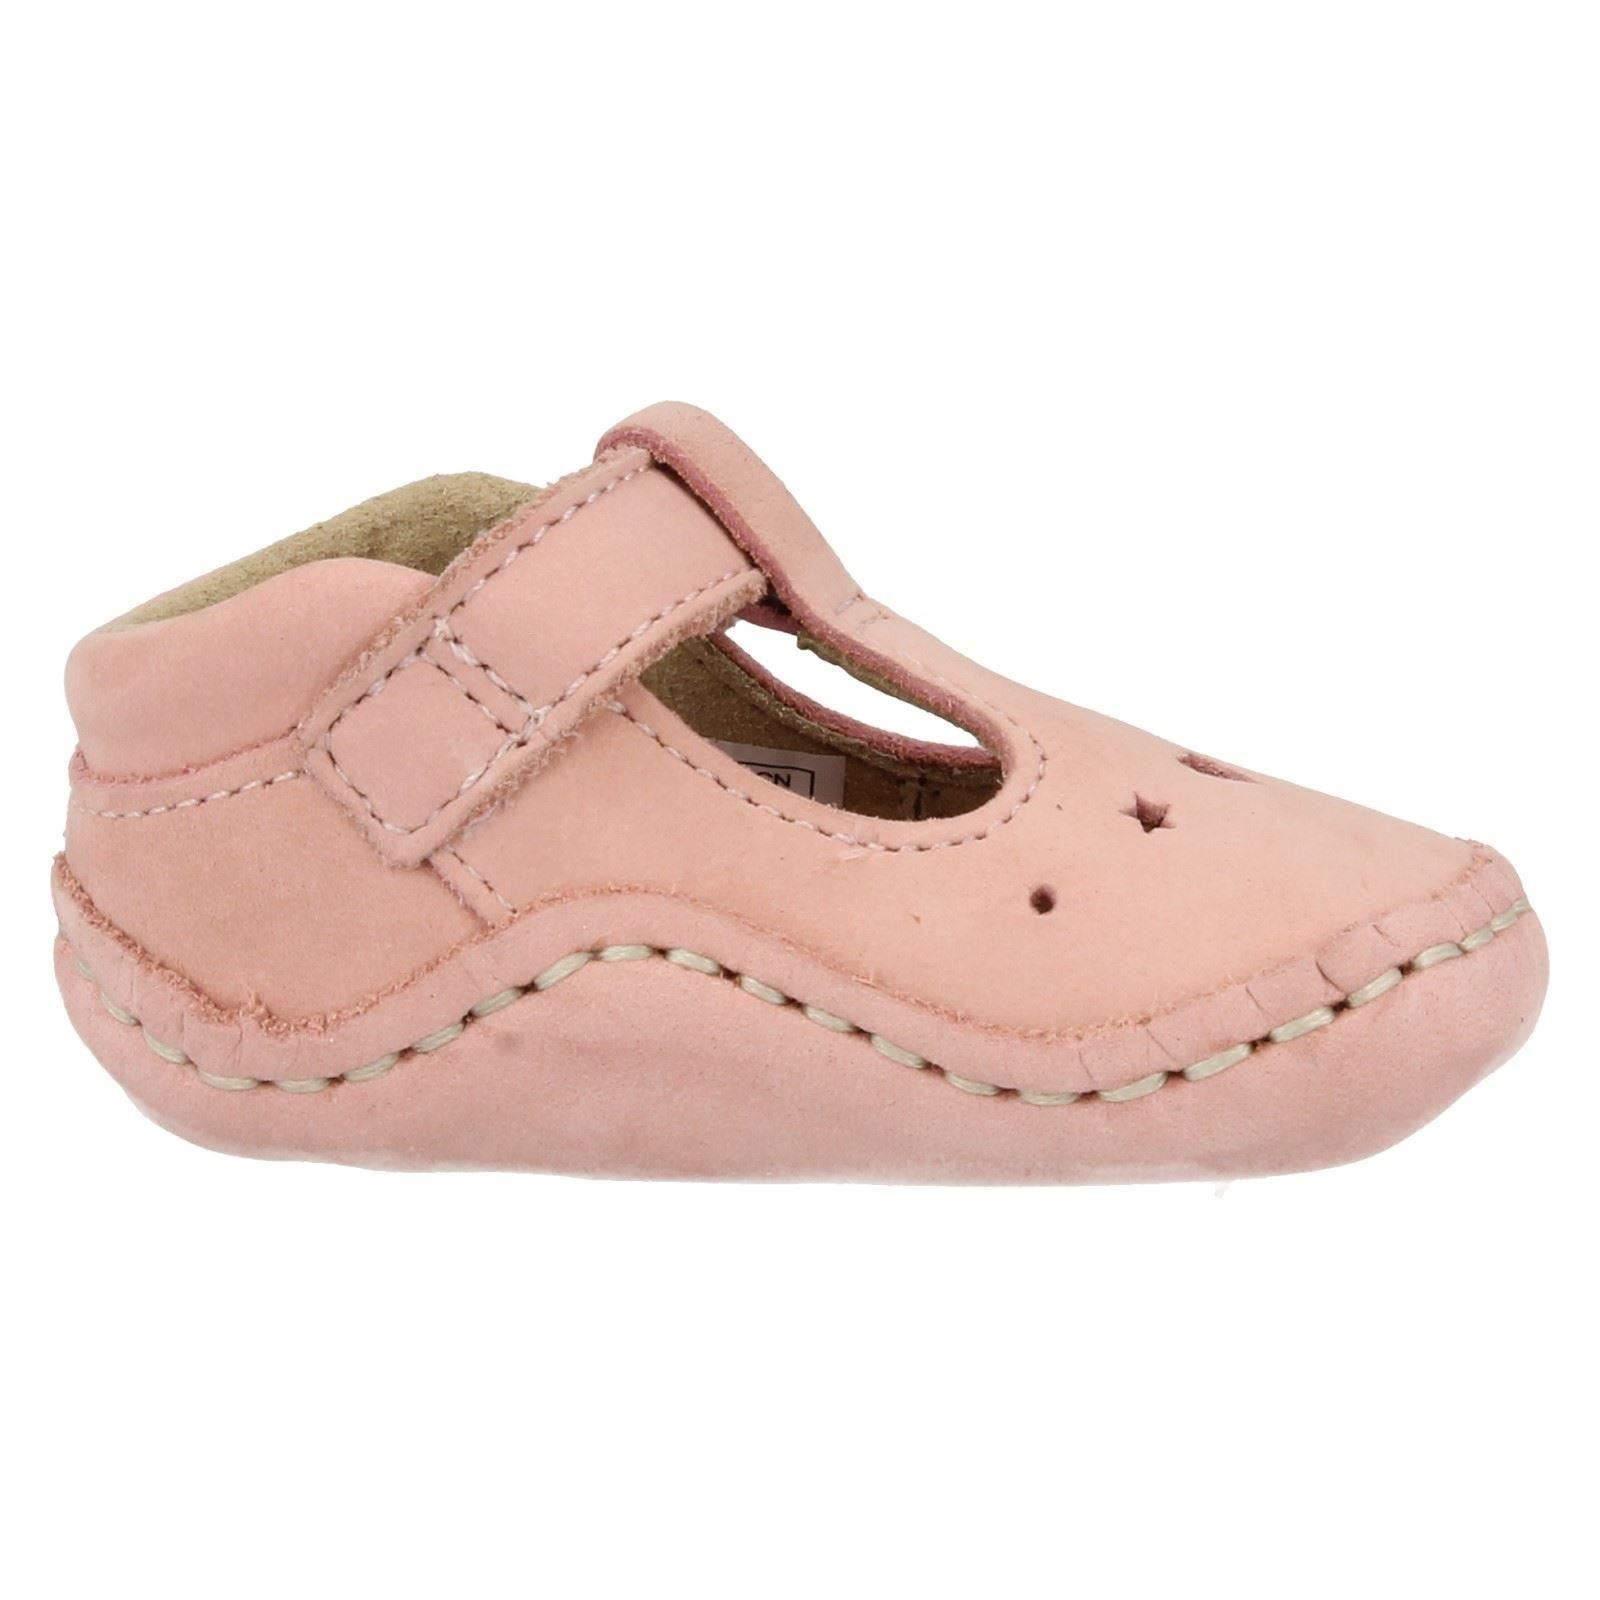 Clarks Baby Girls Pram Shoes Toy